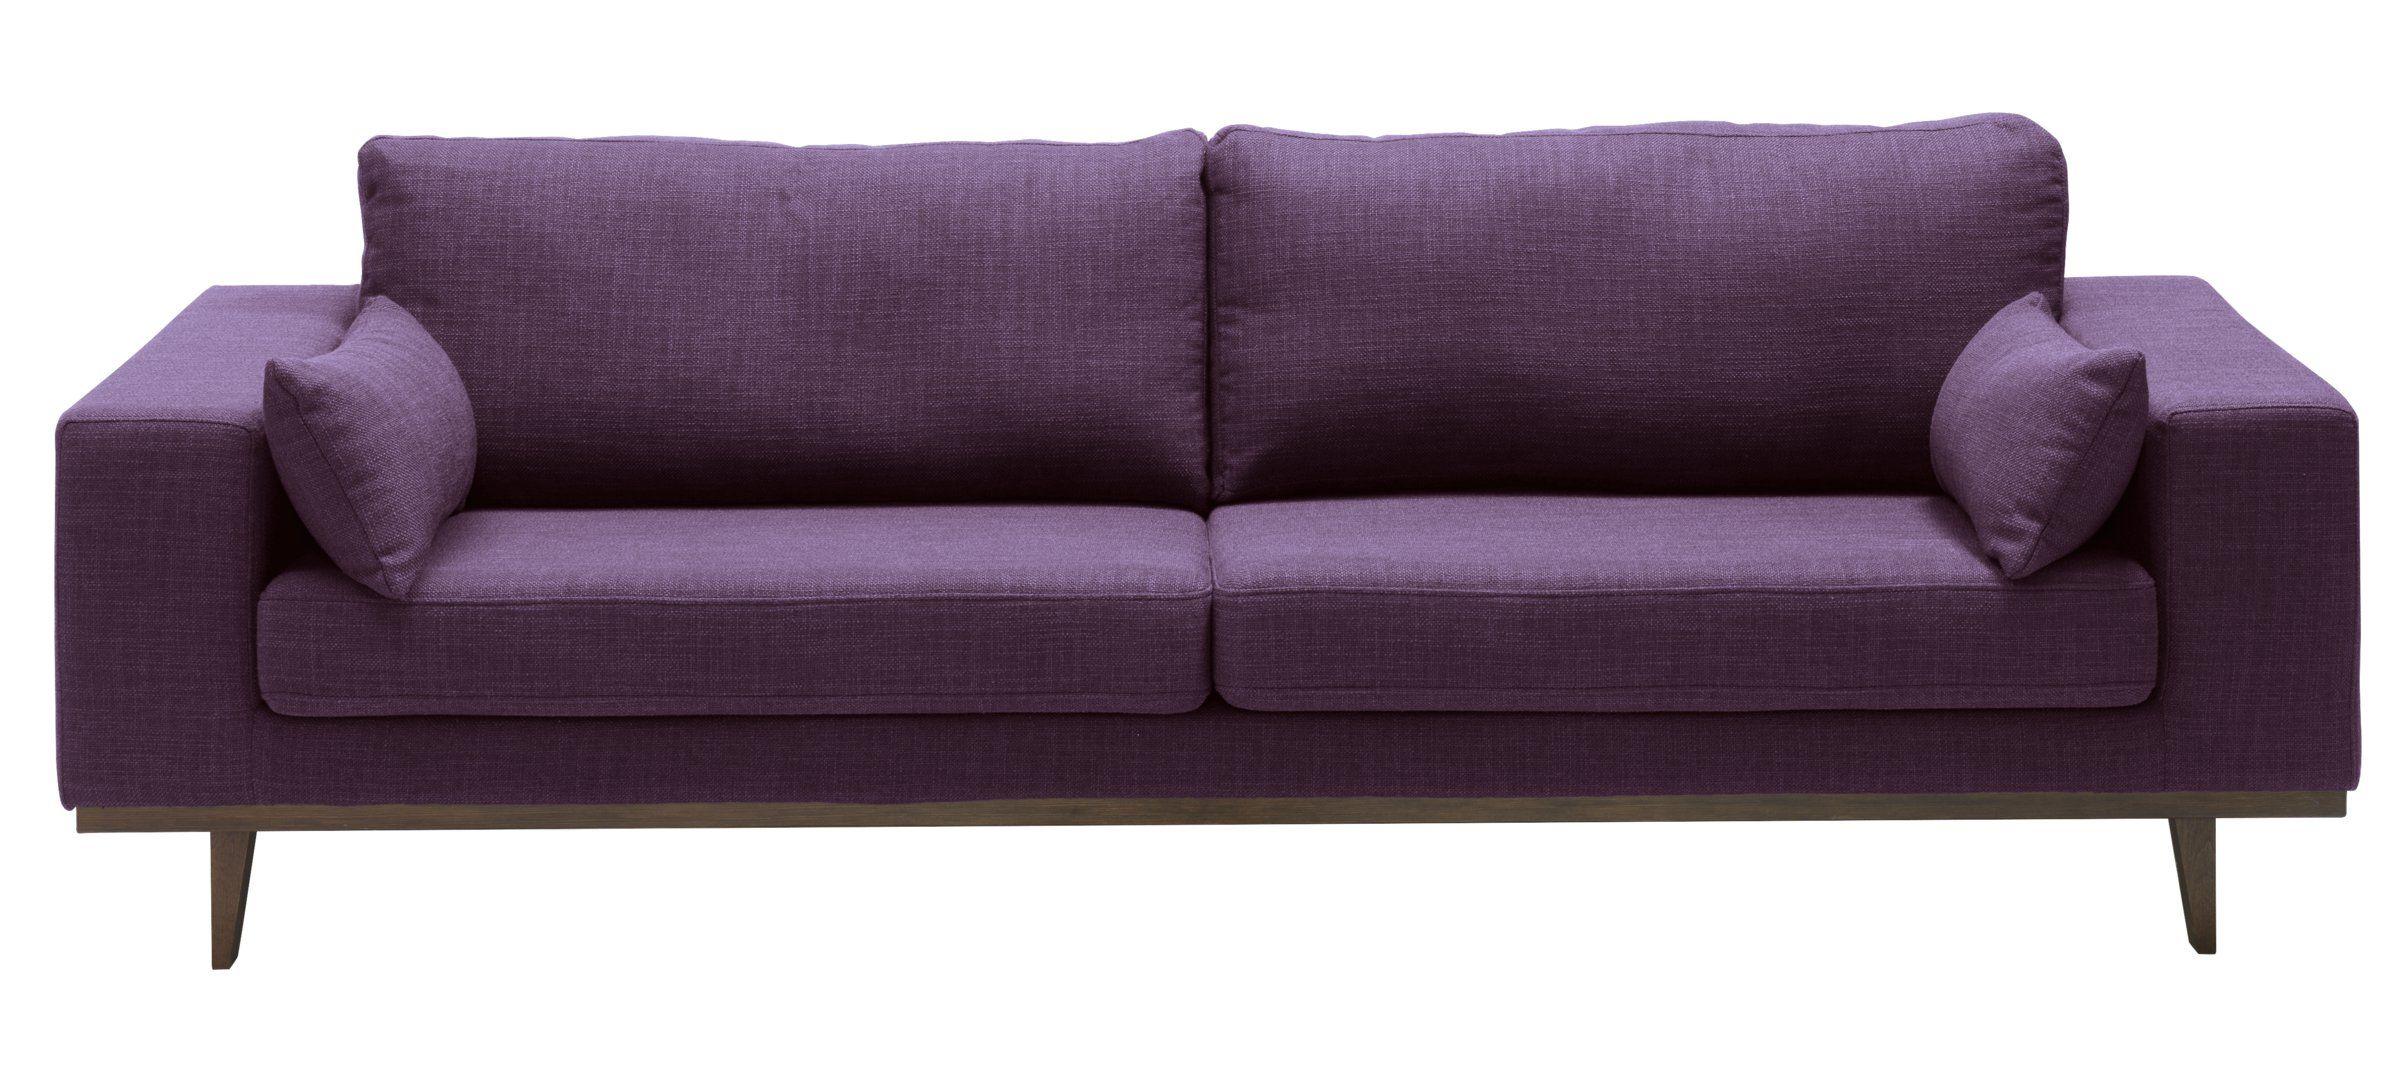 Sofa 3er Awesome Excellent Sofa Grau Couch Sitzgruppe Er Sofa